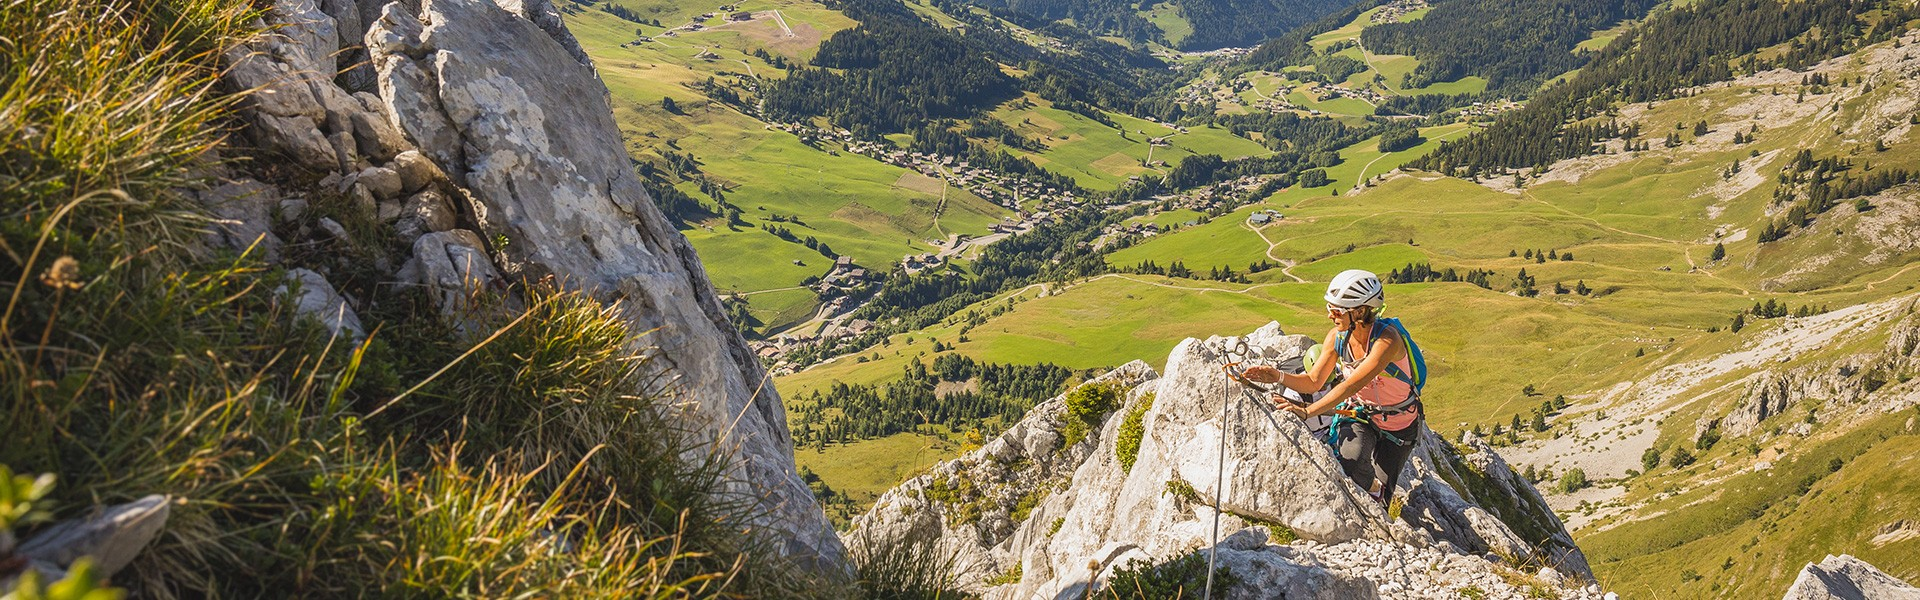 Climbing and via ferrata